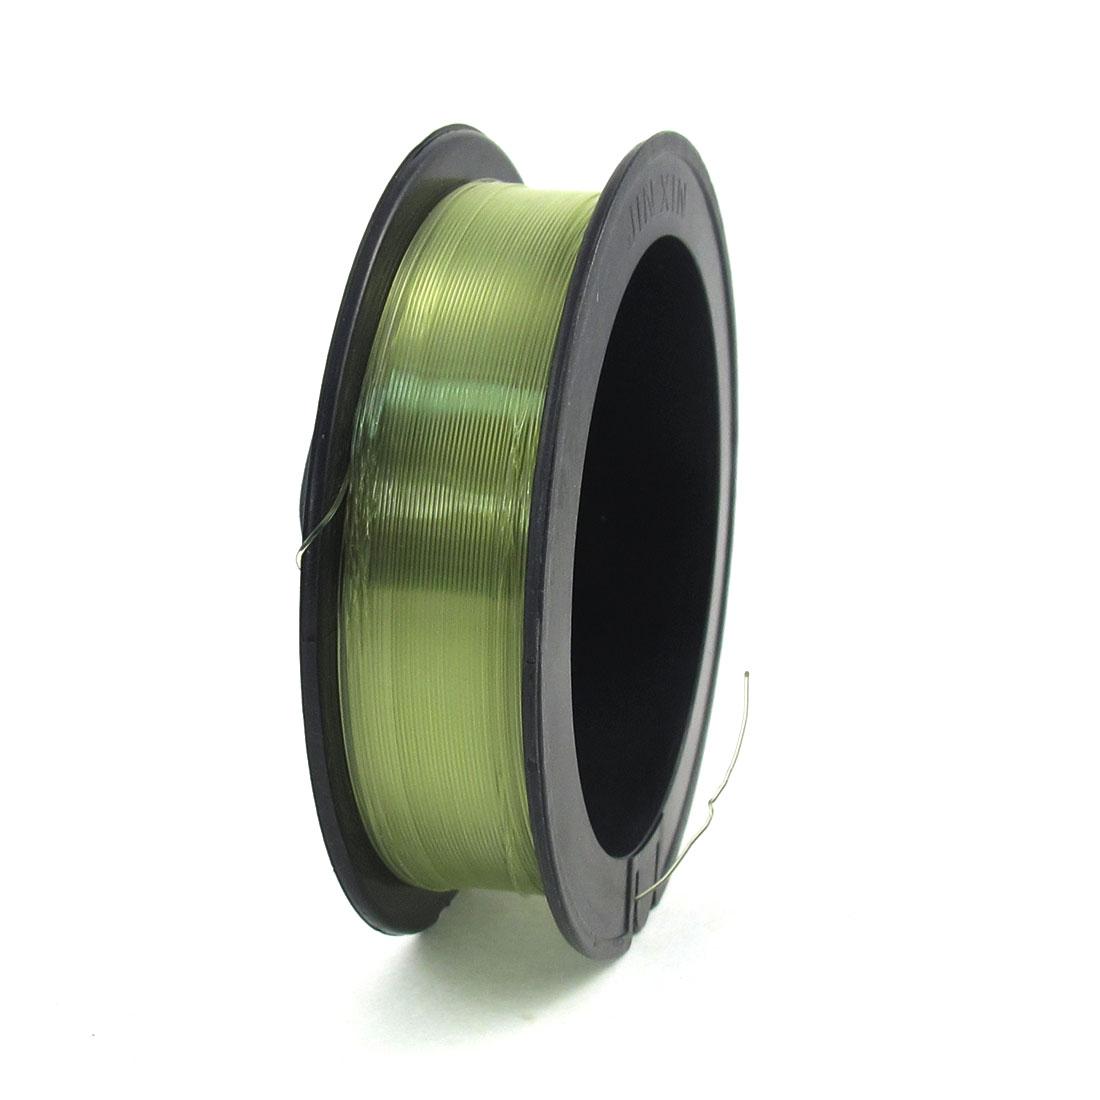 0.470mm Dia 8.0# 17.5Kg Capacity Light Green Fishing Line Thread Reel 100M